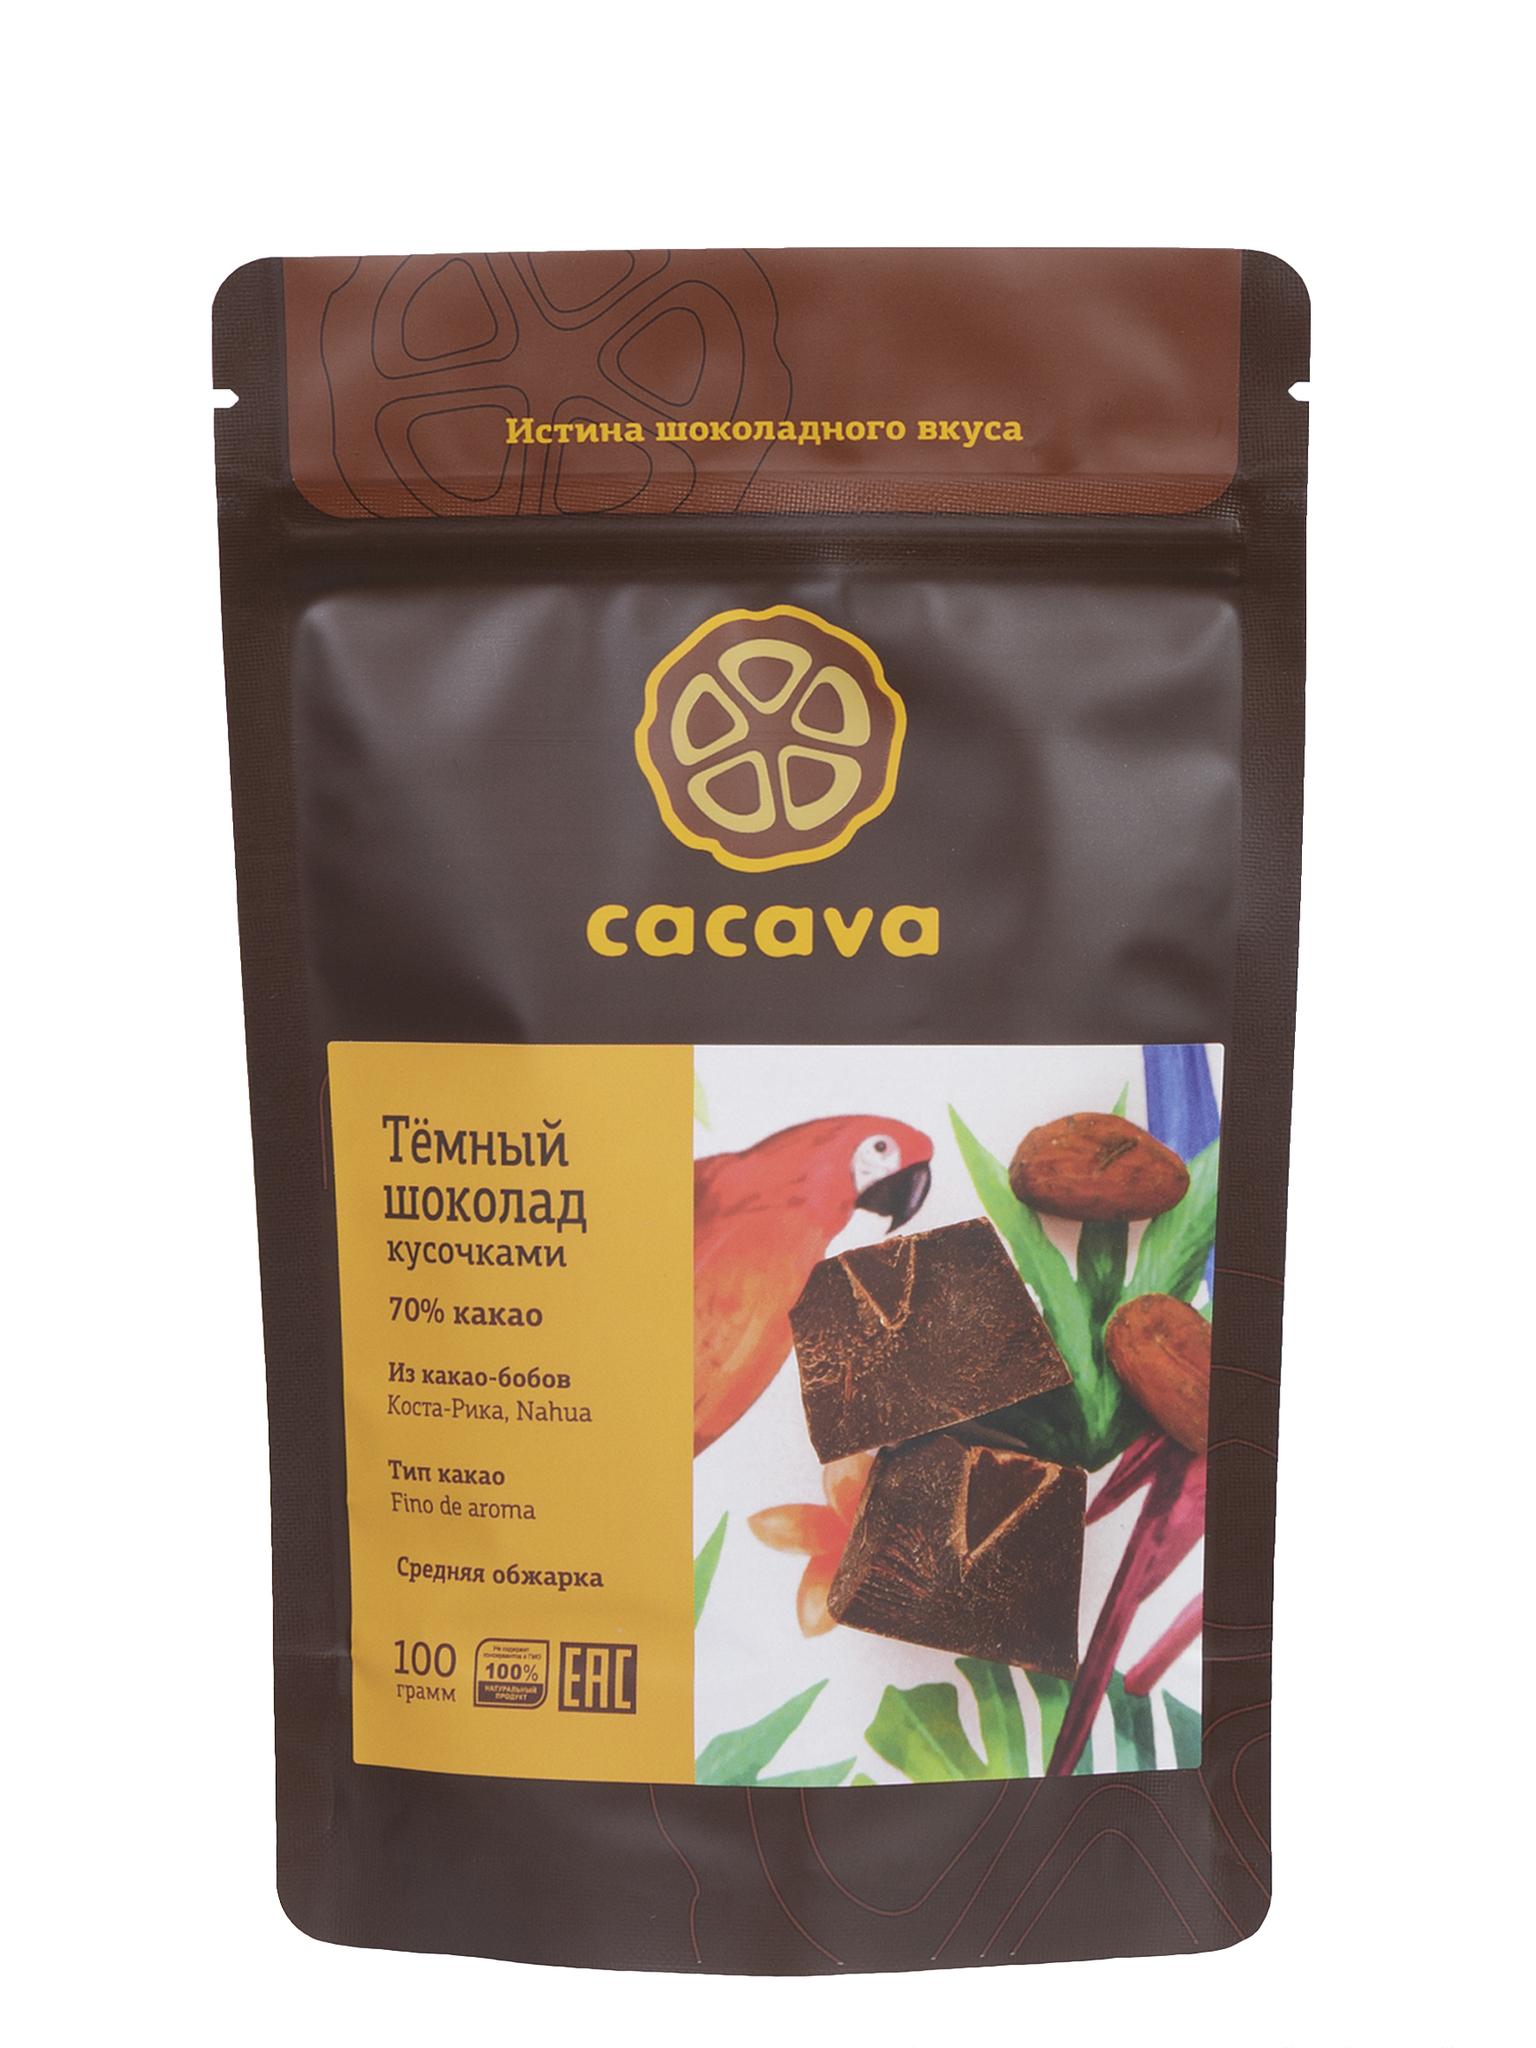 Тёмный шоколад 70 % какао (Коста-Рика), упаковка 100 грамм